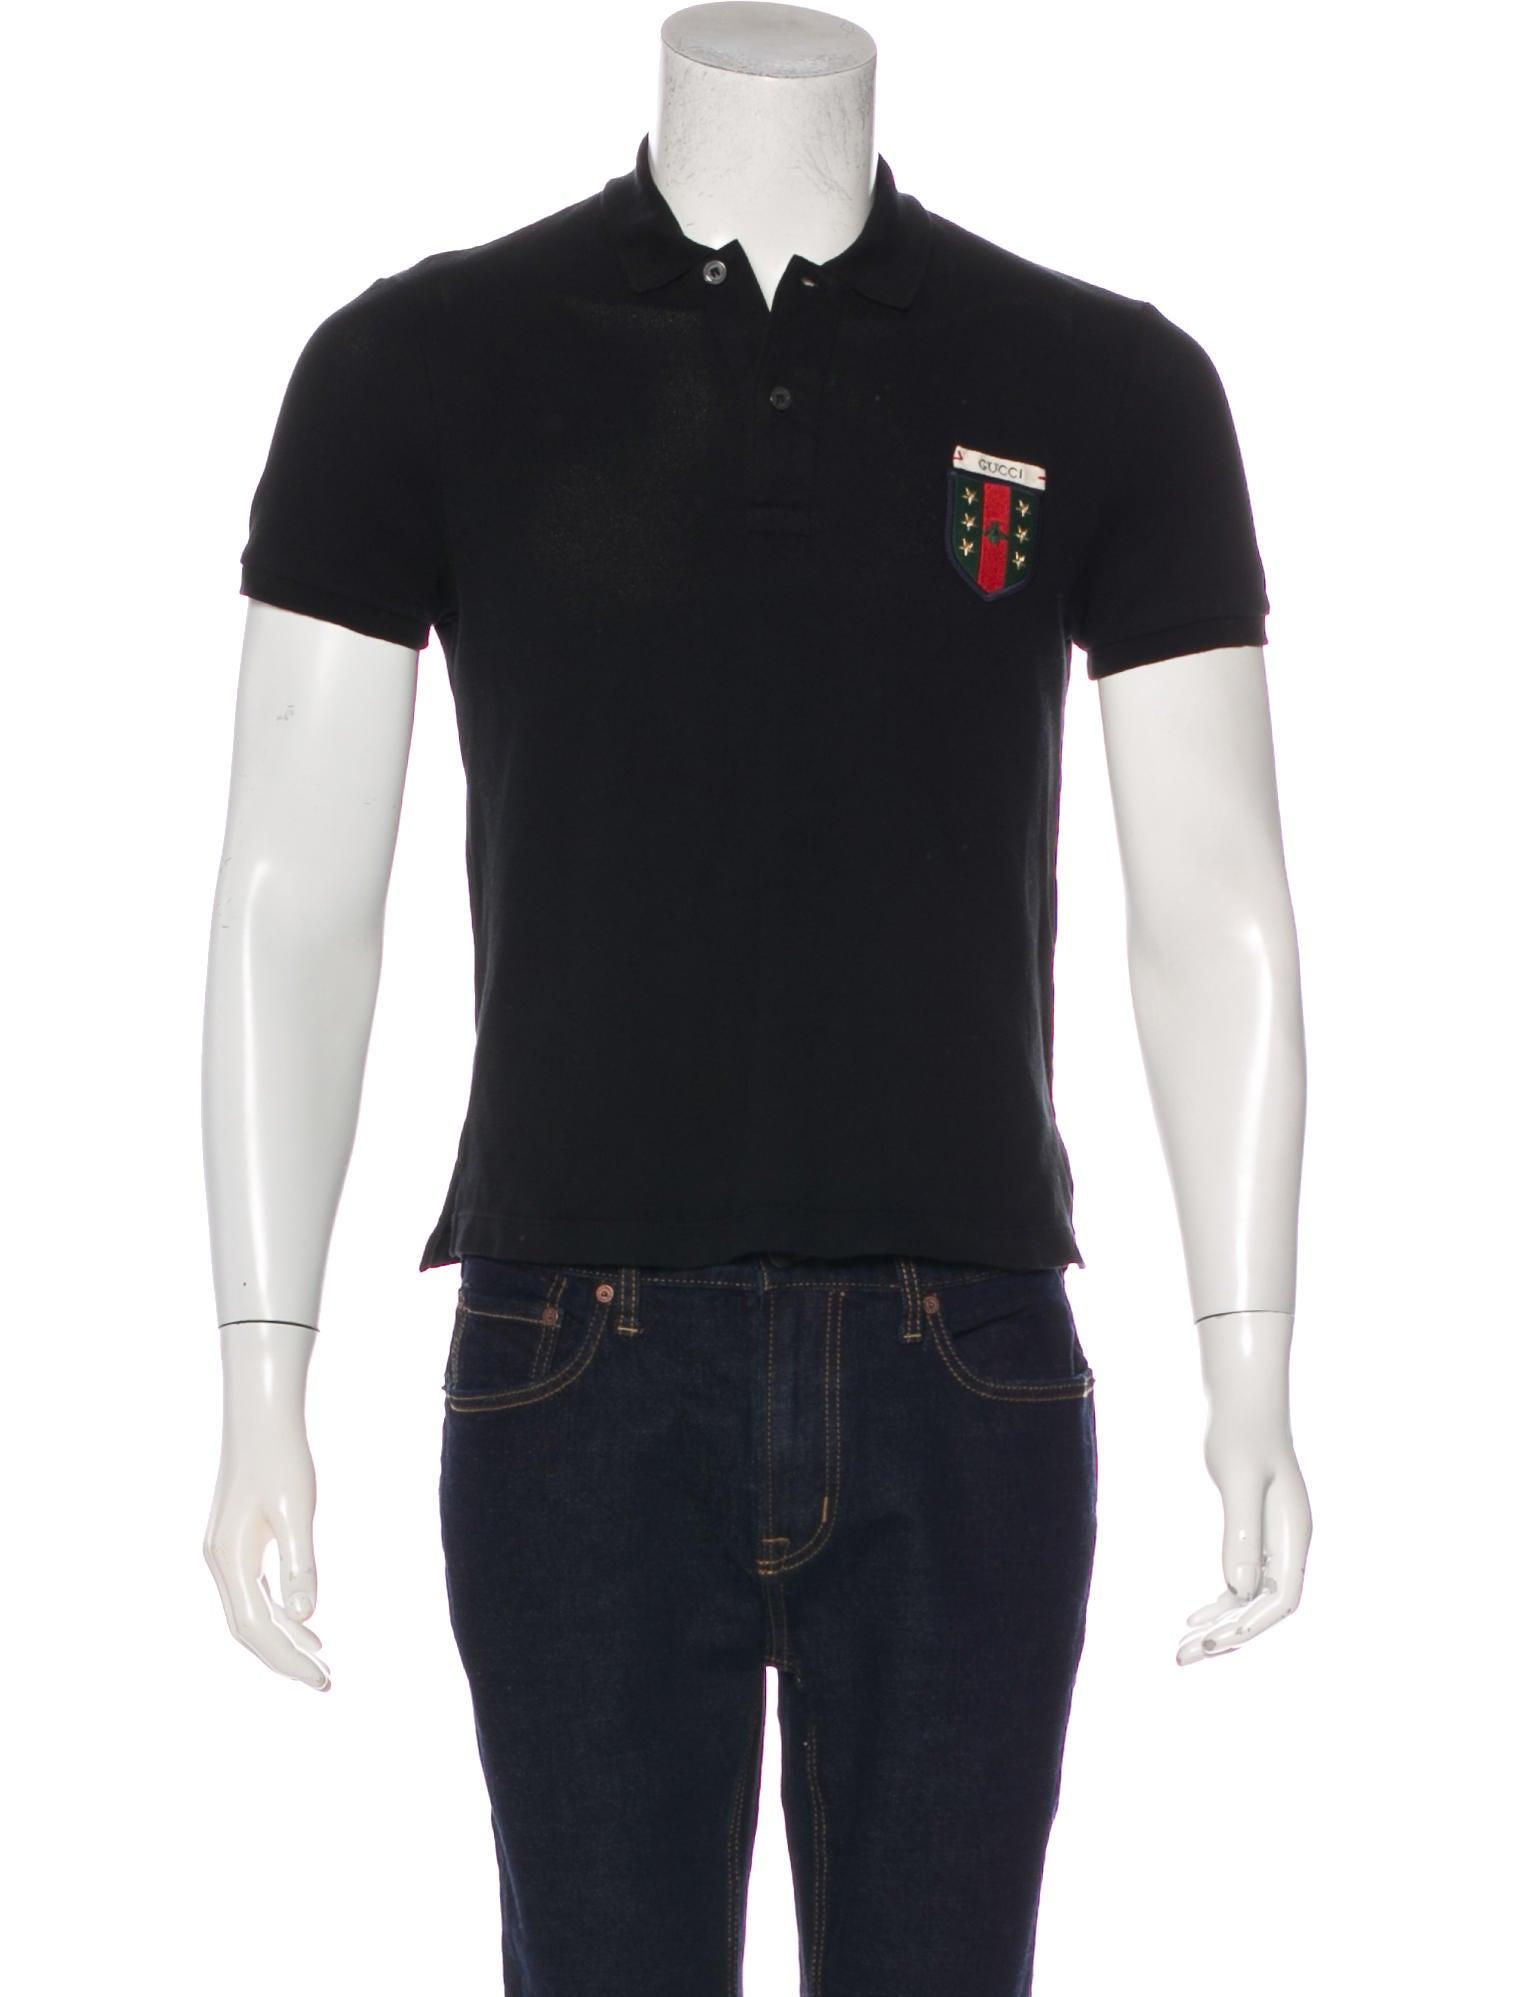 7a8e2617b Gucci 2018 Web Crest Appliqué Polo Shirt - Clothing - GUC216335 ...